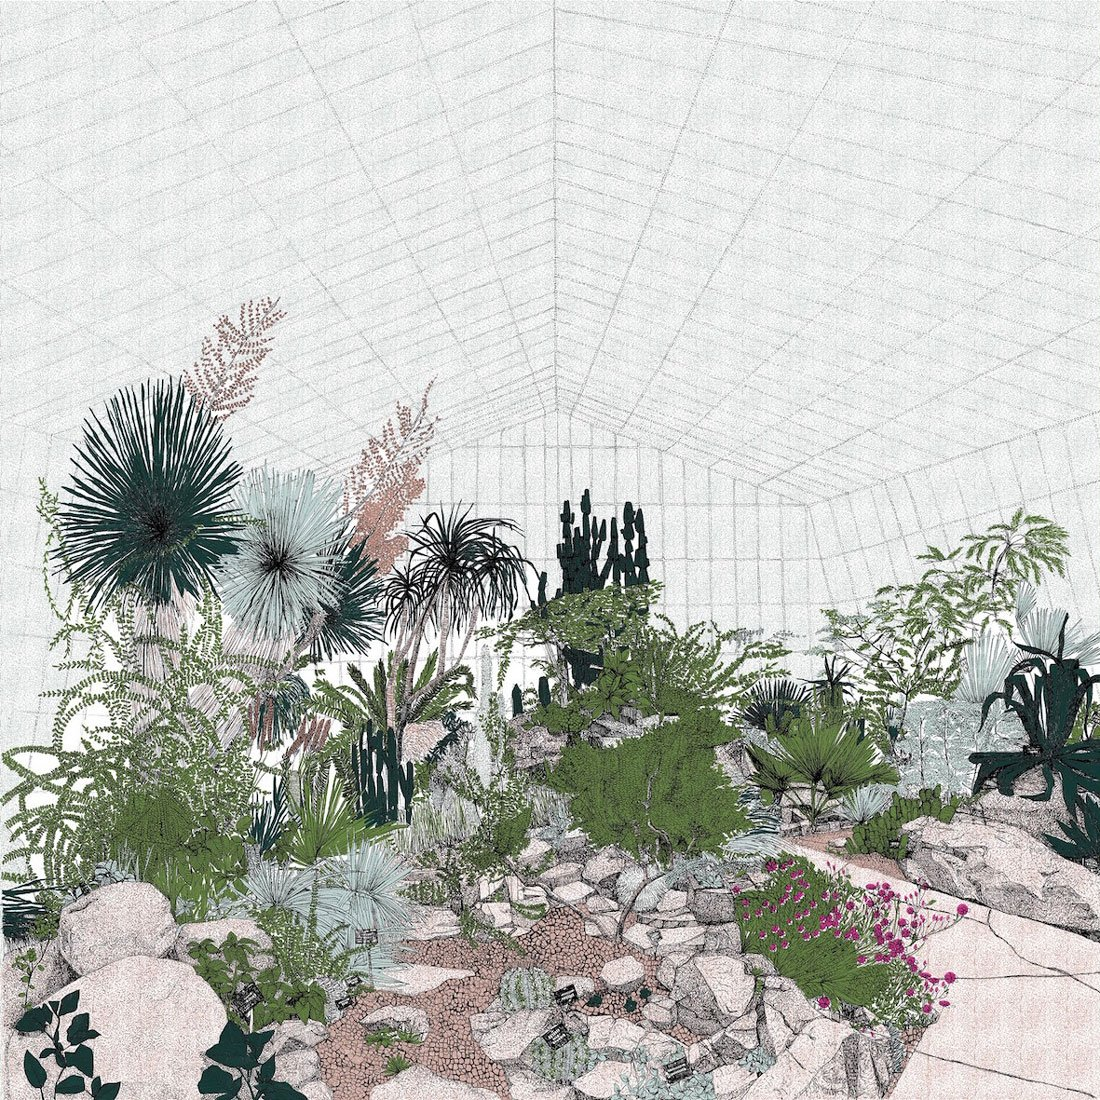 Clare Halifax - Hot Mass of Cacti, 7 colour screen print. 50 x 50cm